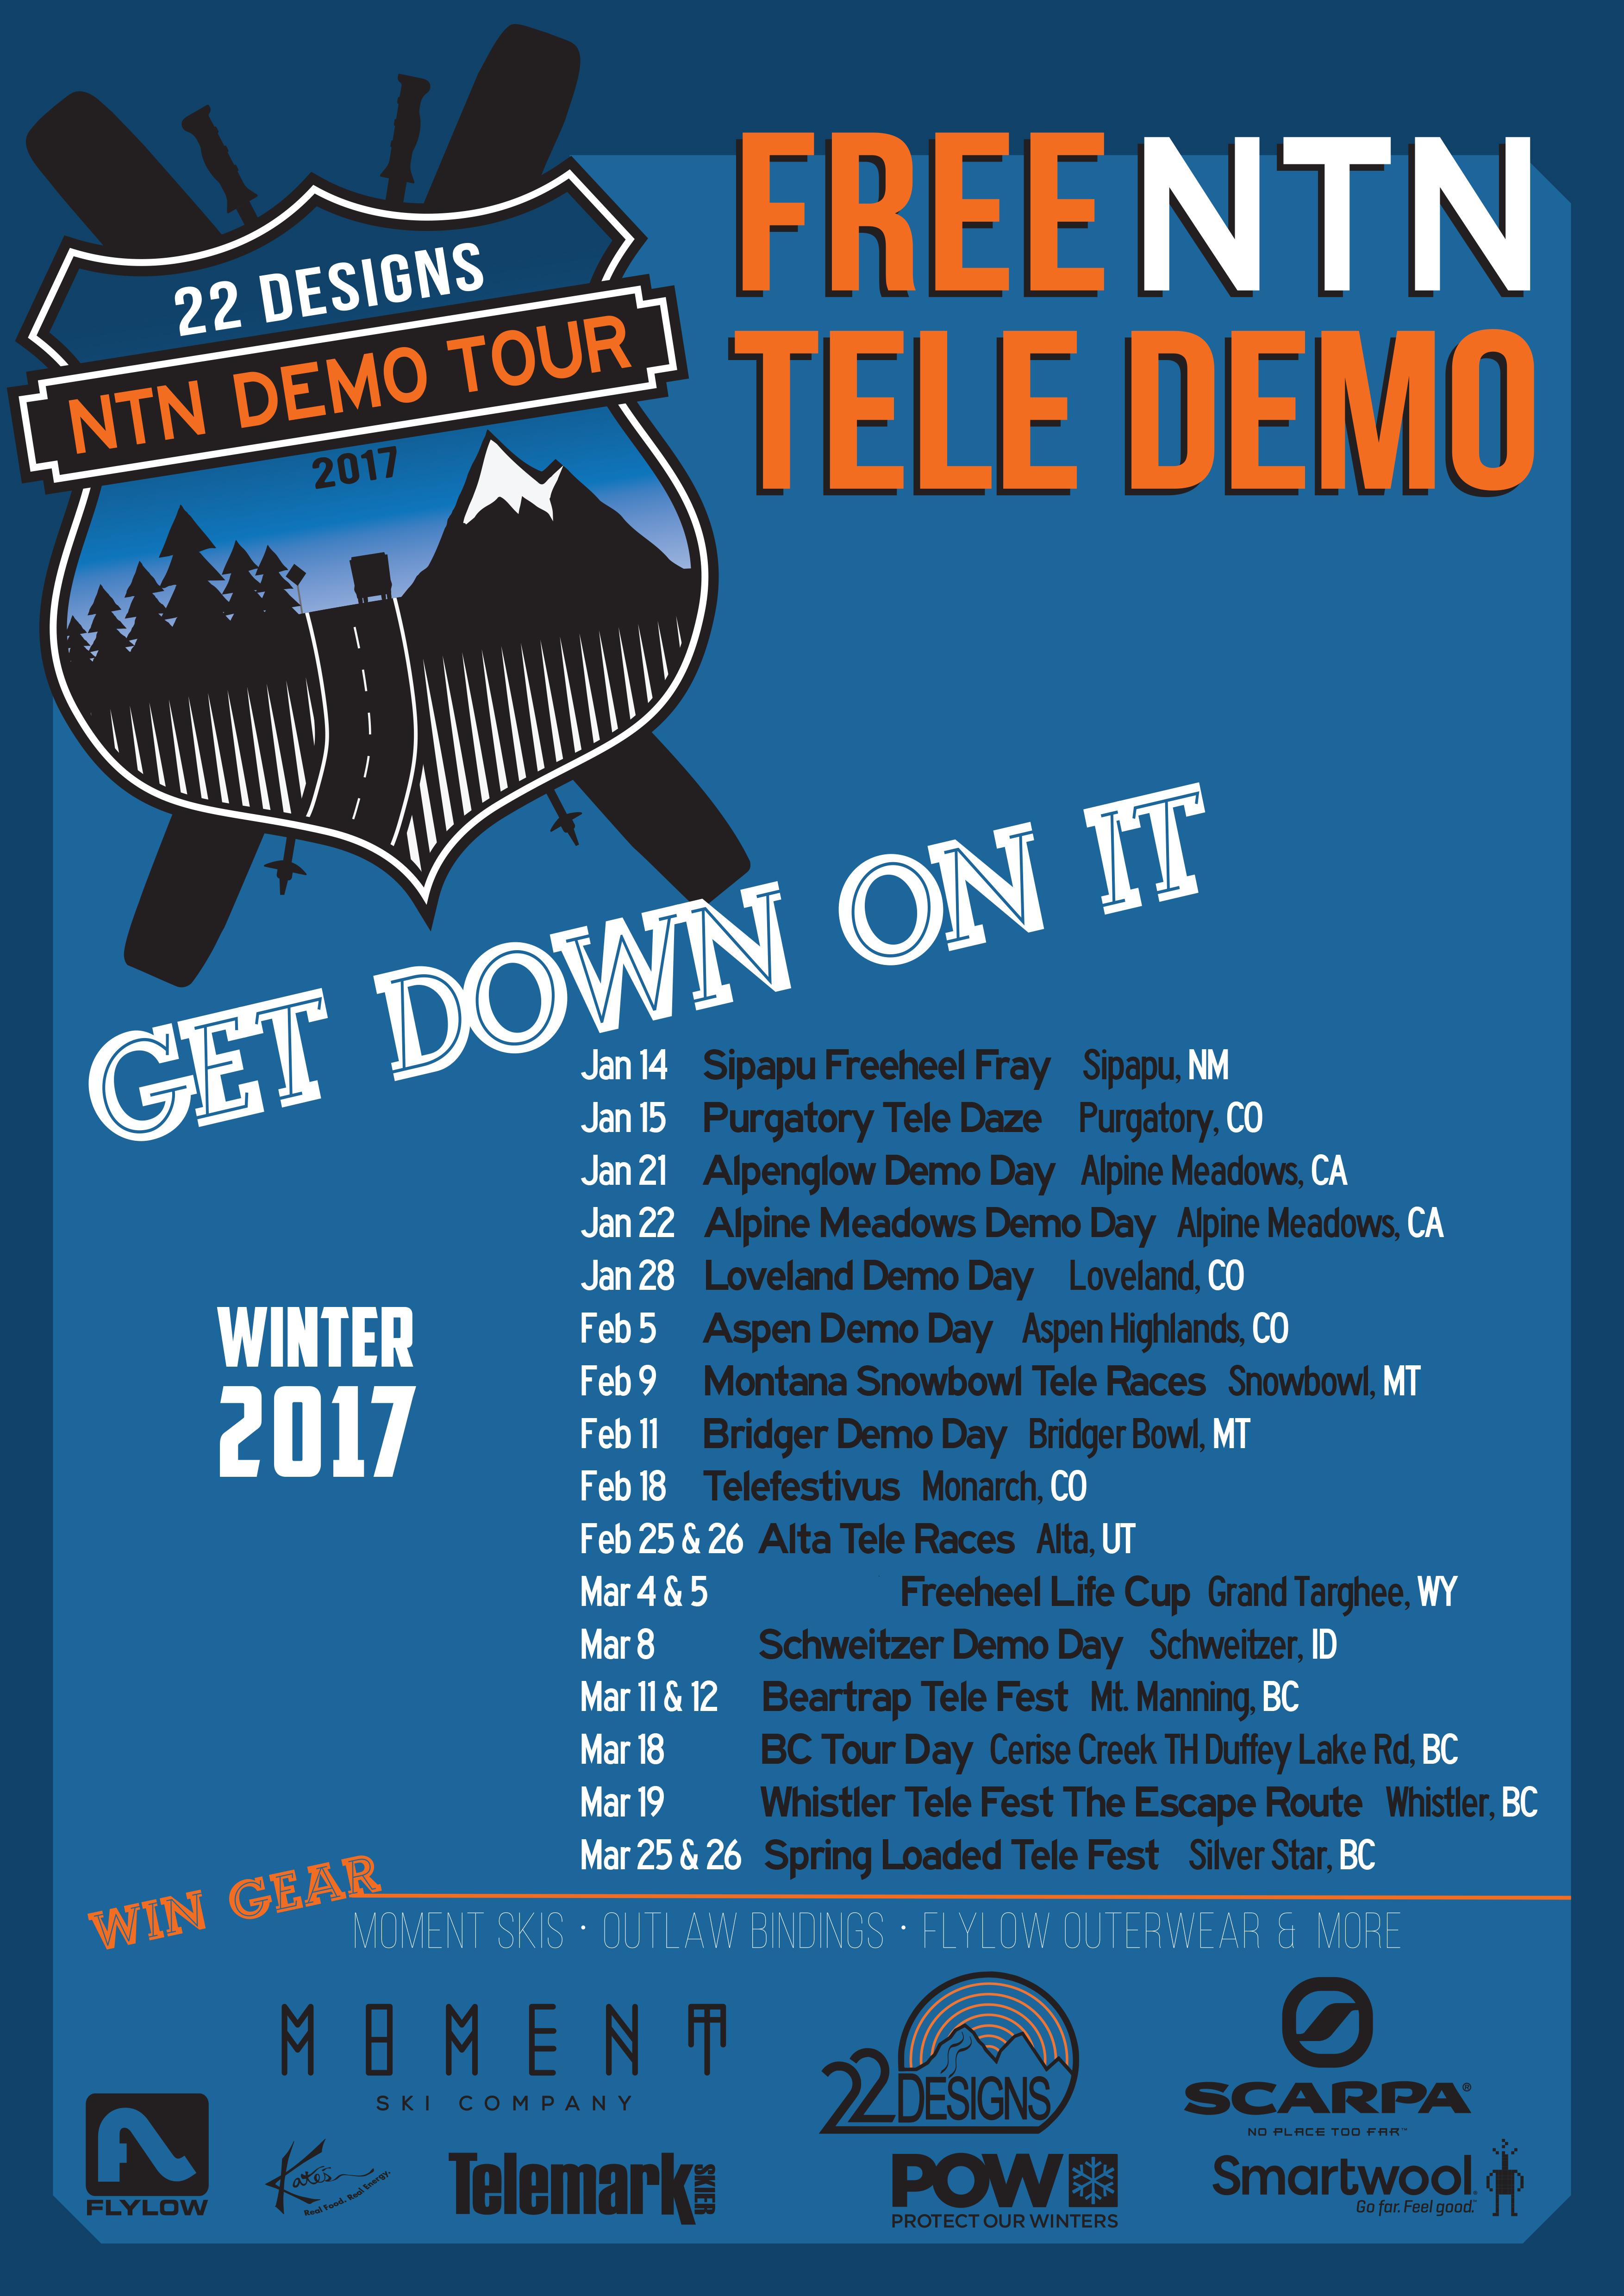 22 Designs West Coast NTN Demo Tour